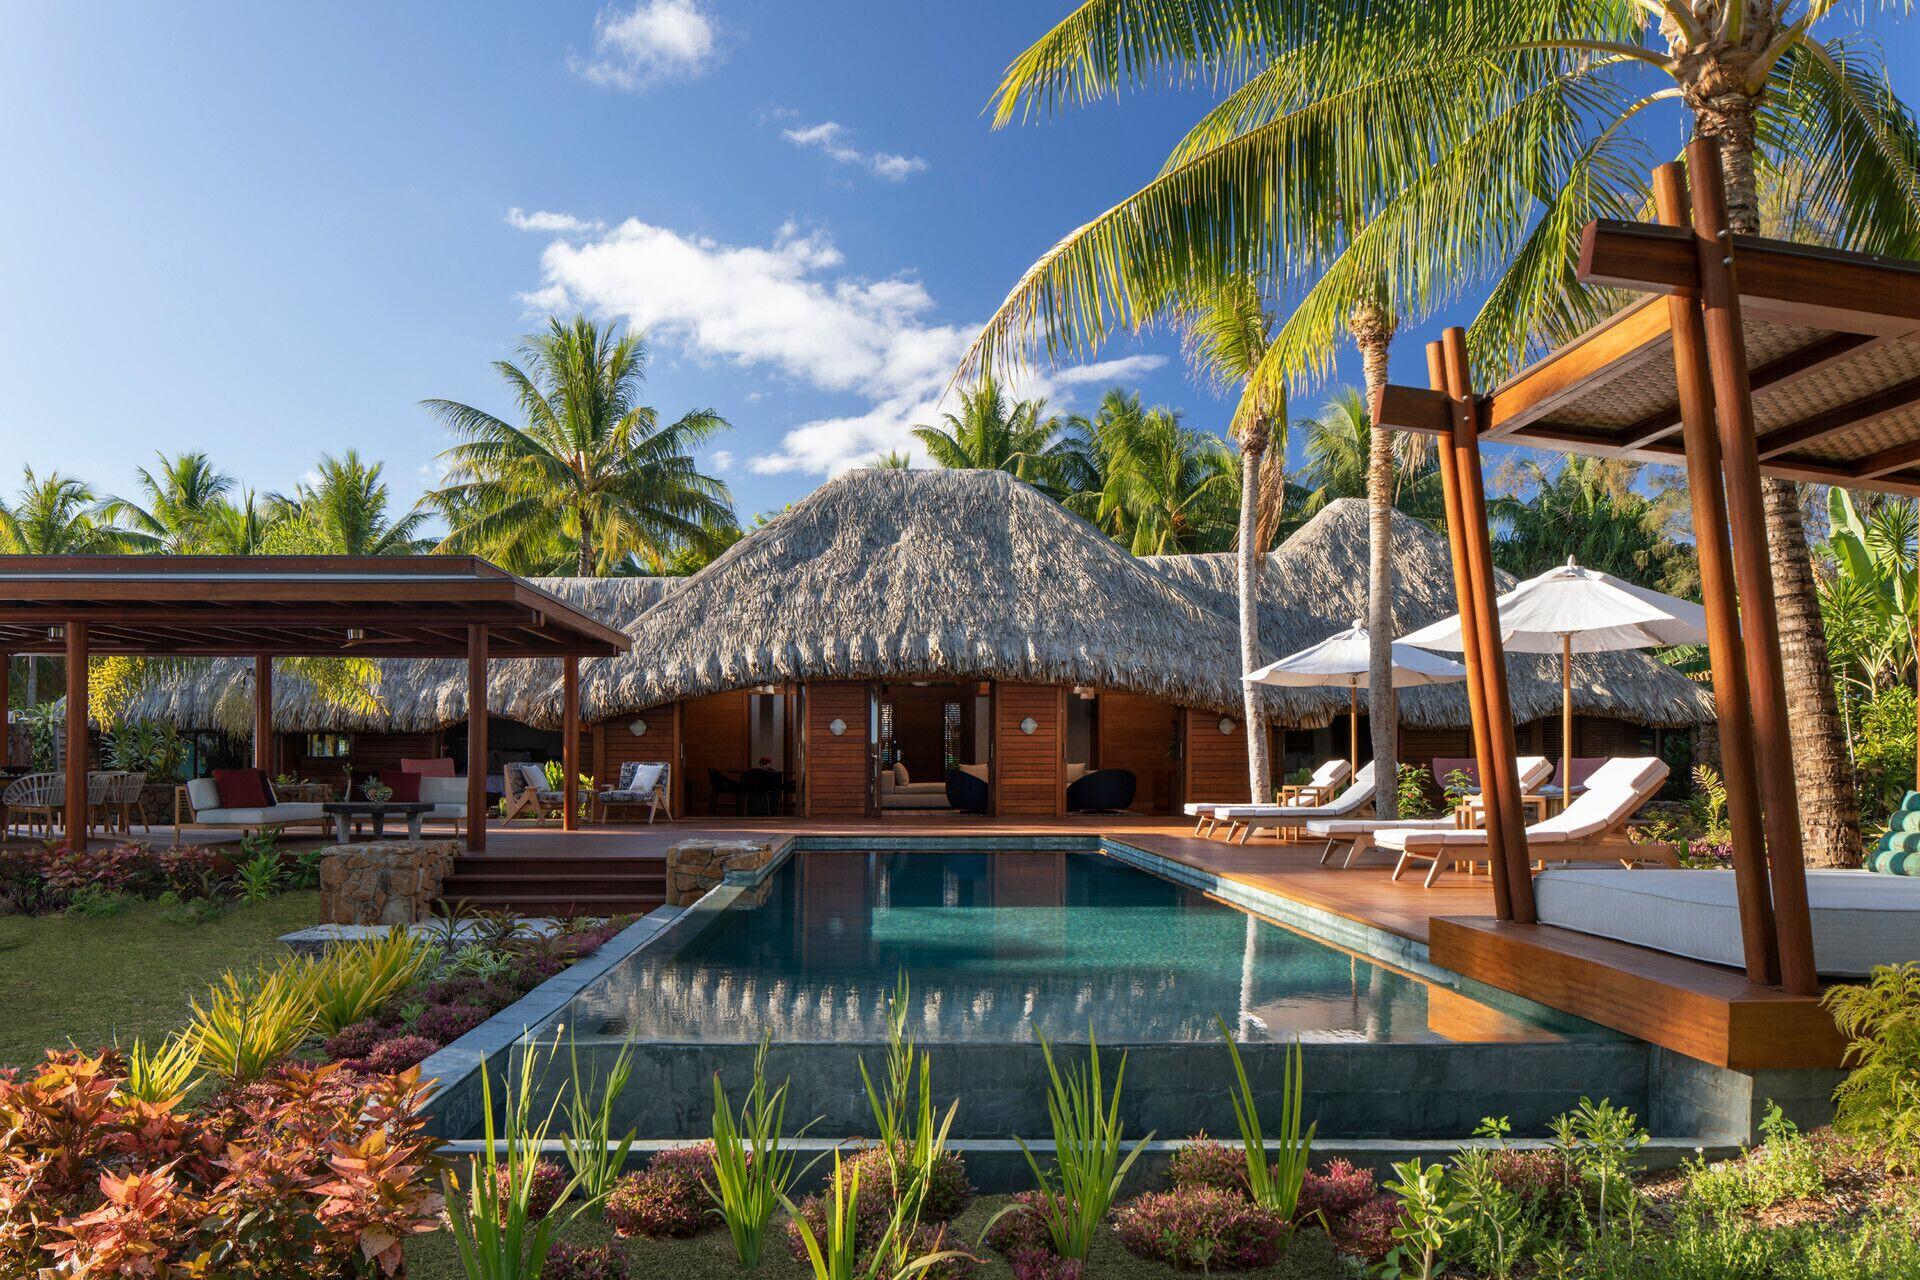 Courtesy of Four Seasons Resort Bora Bora / Expedia